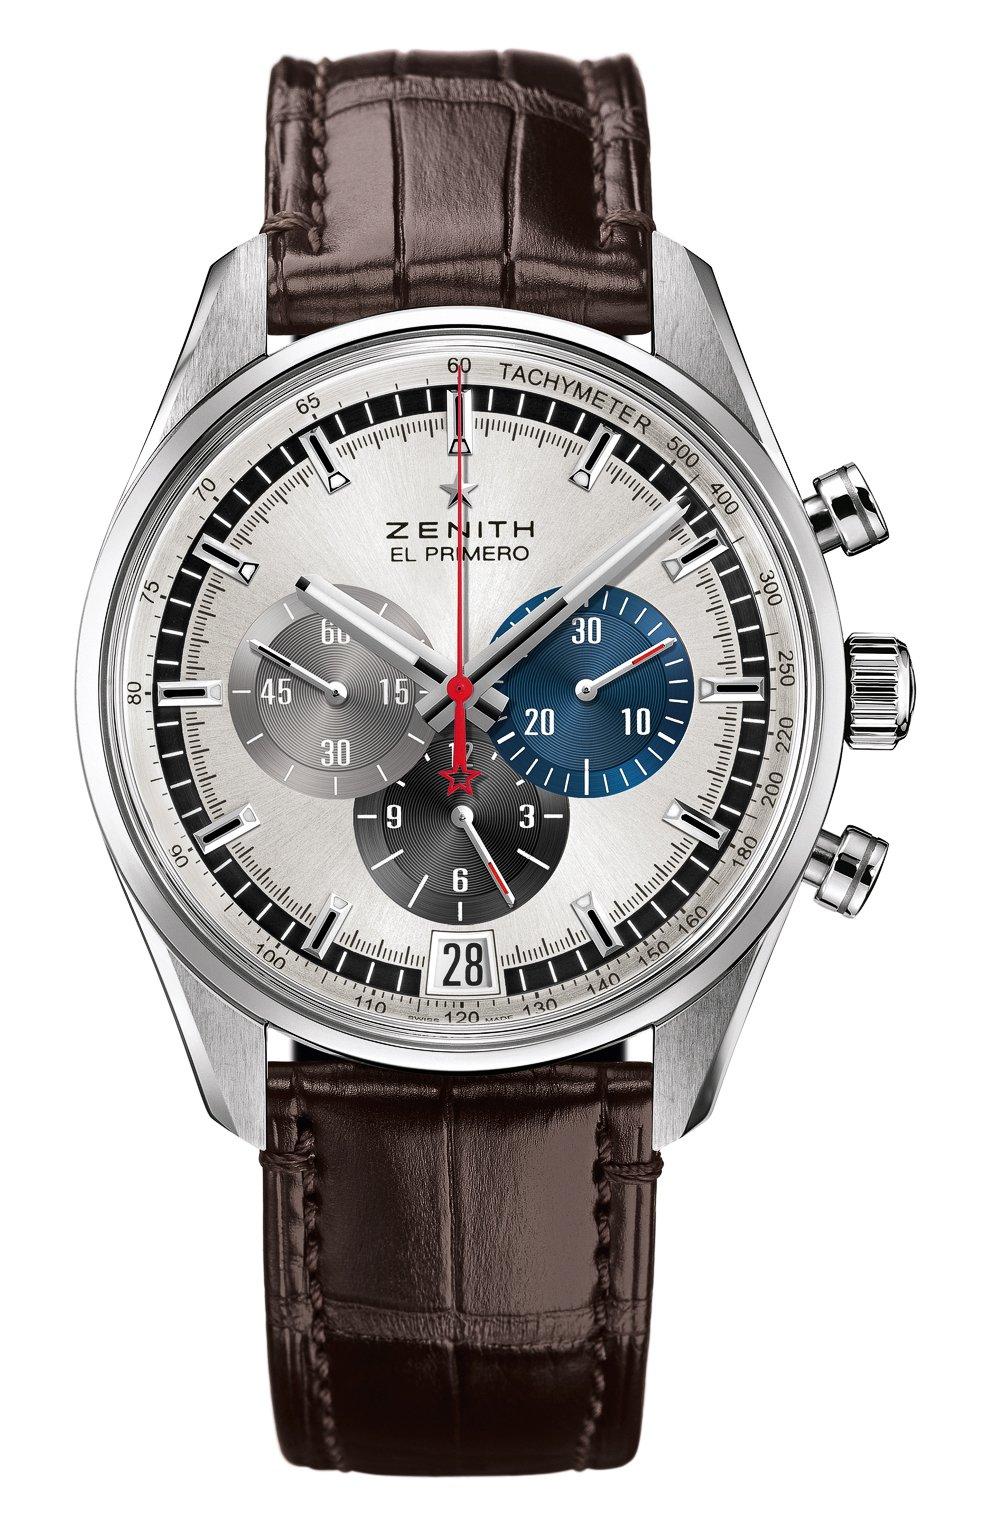 Мужские часы 36000 vph chronograph silver ZENITH серебряного цвета, арт. 03.2040.400/69.C | Фото 1